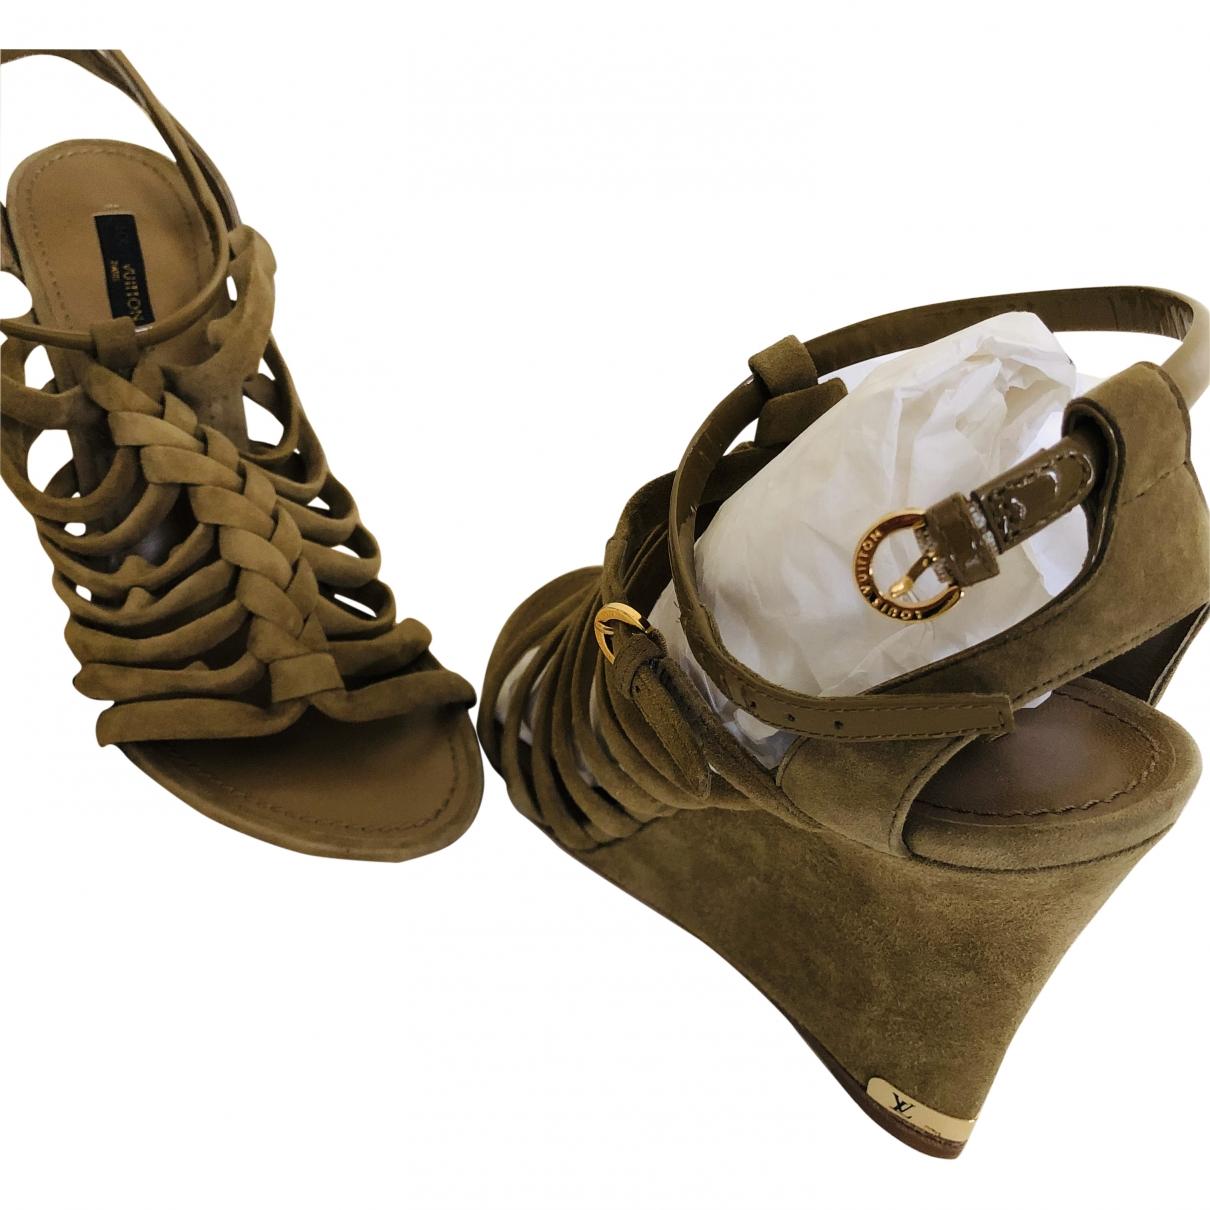 Louis Vuitton \N Khaki Suede Sandals for Women 39 EU